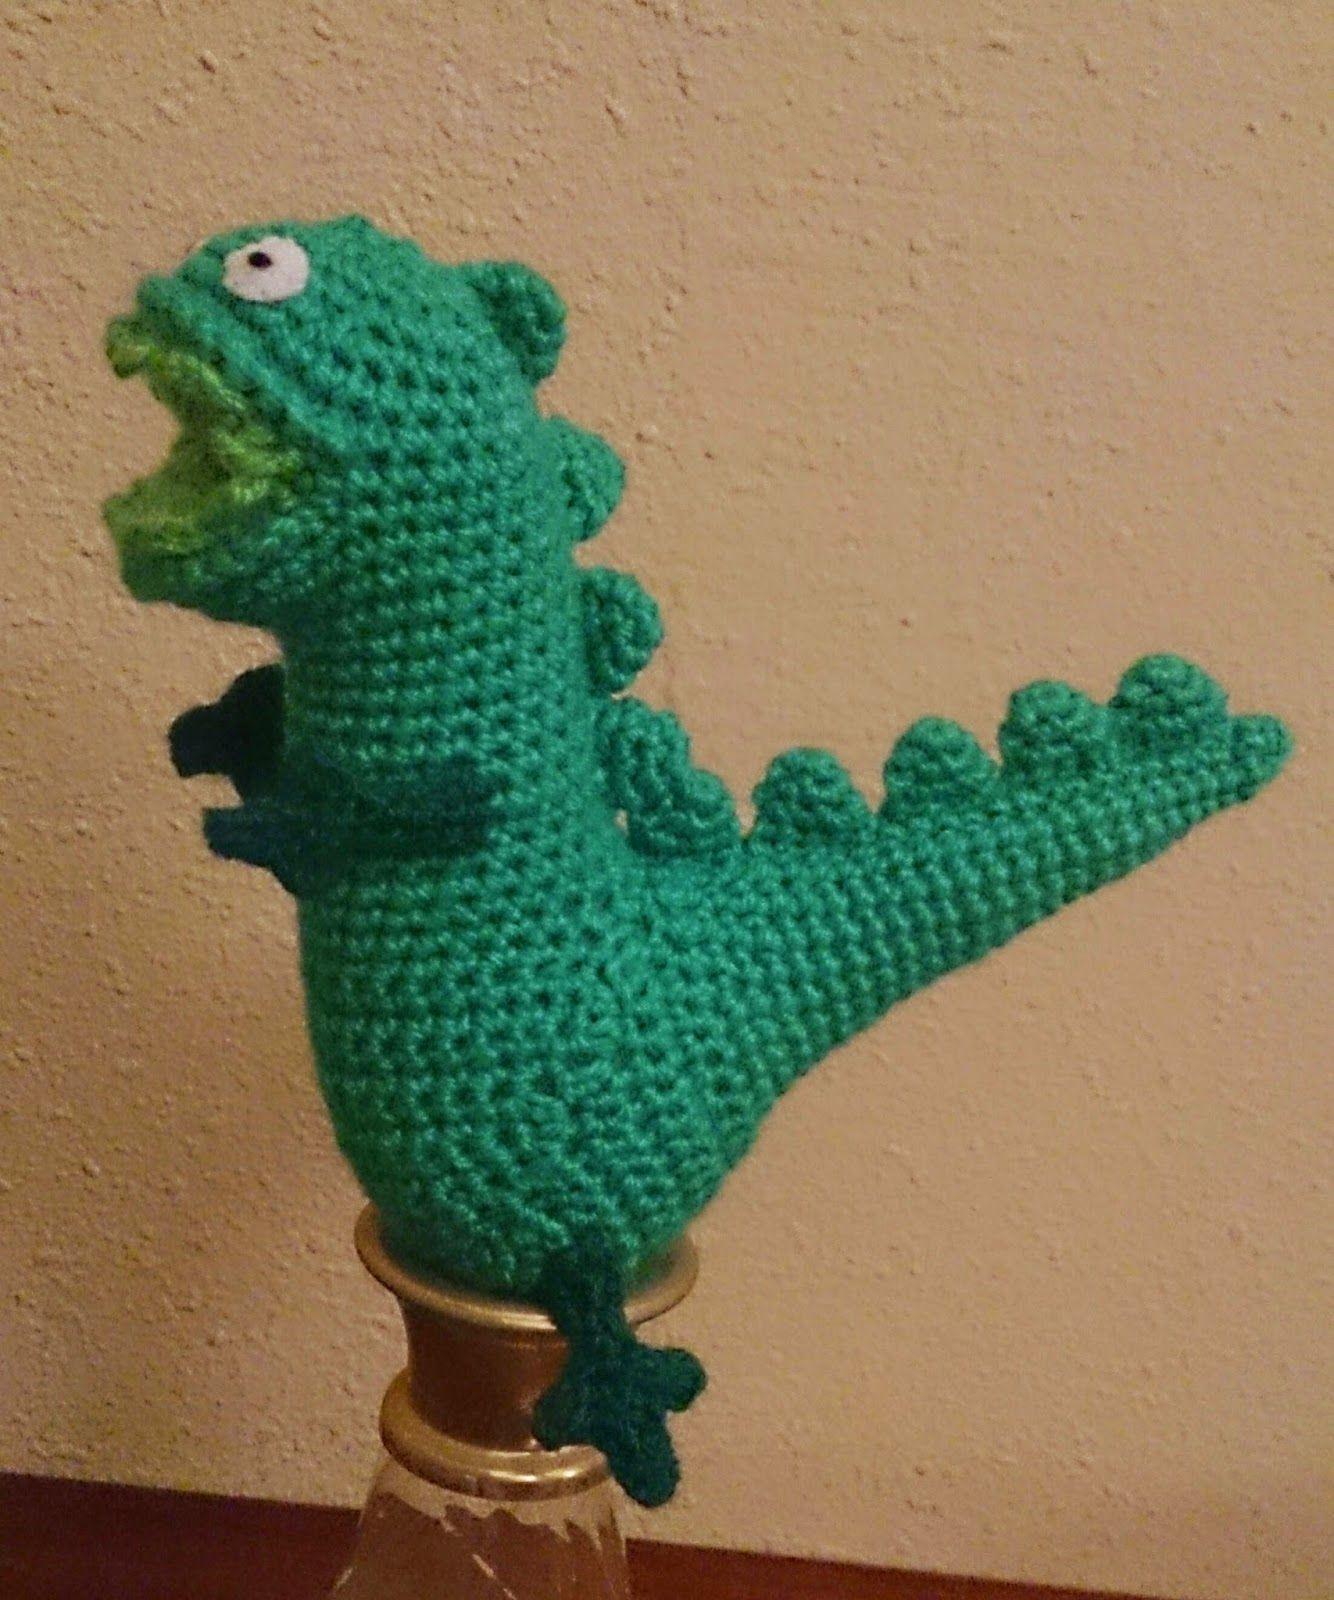 Peppa Pig - free crochet pattern | Crochet pig, Crochet patterns ... | 1600x1334